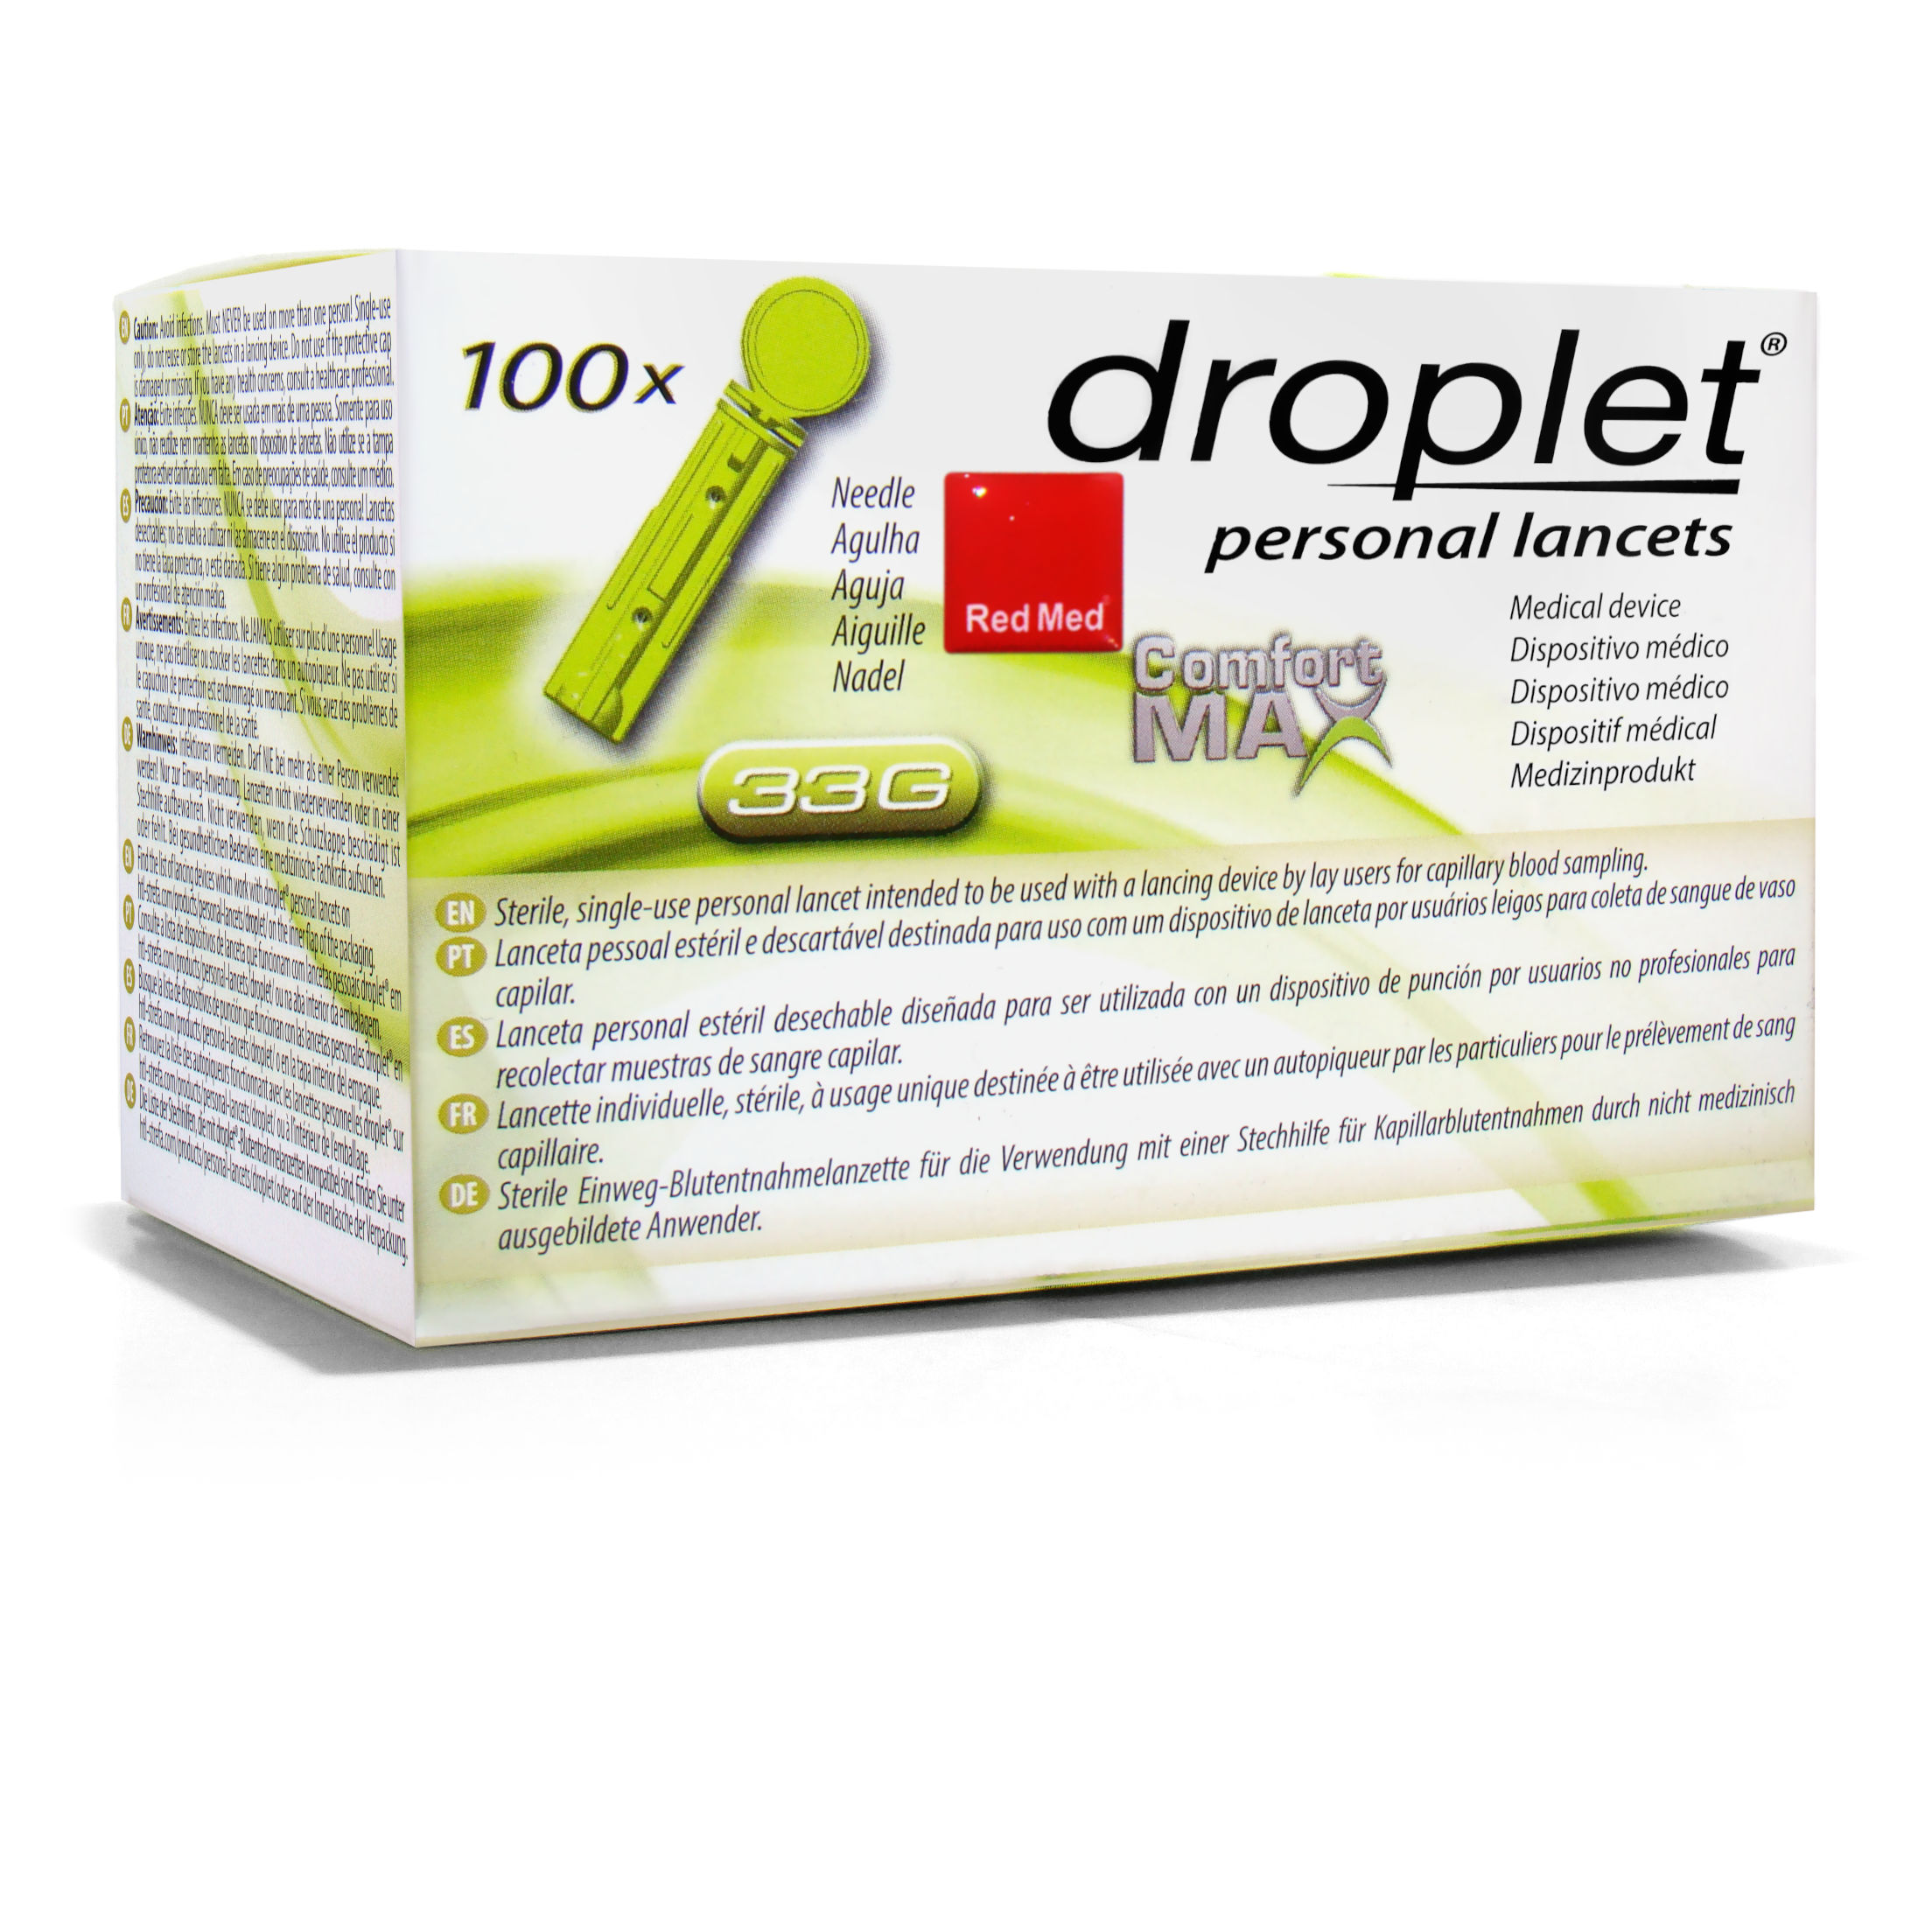 lancety-droplet-33g-opakowanie-100-redmed-2021